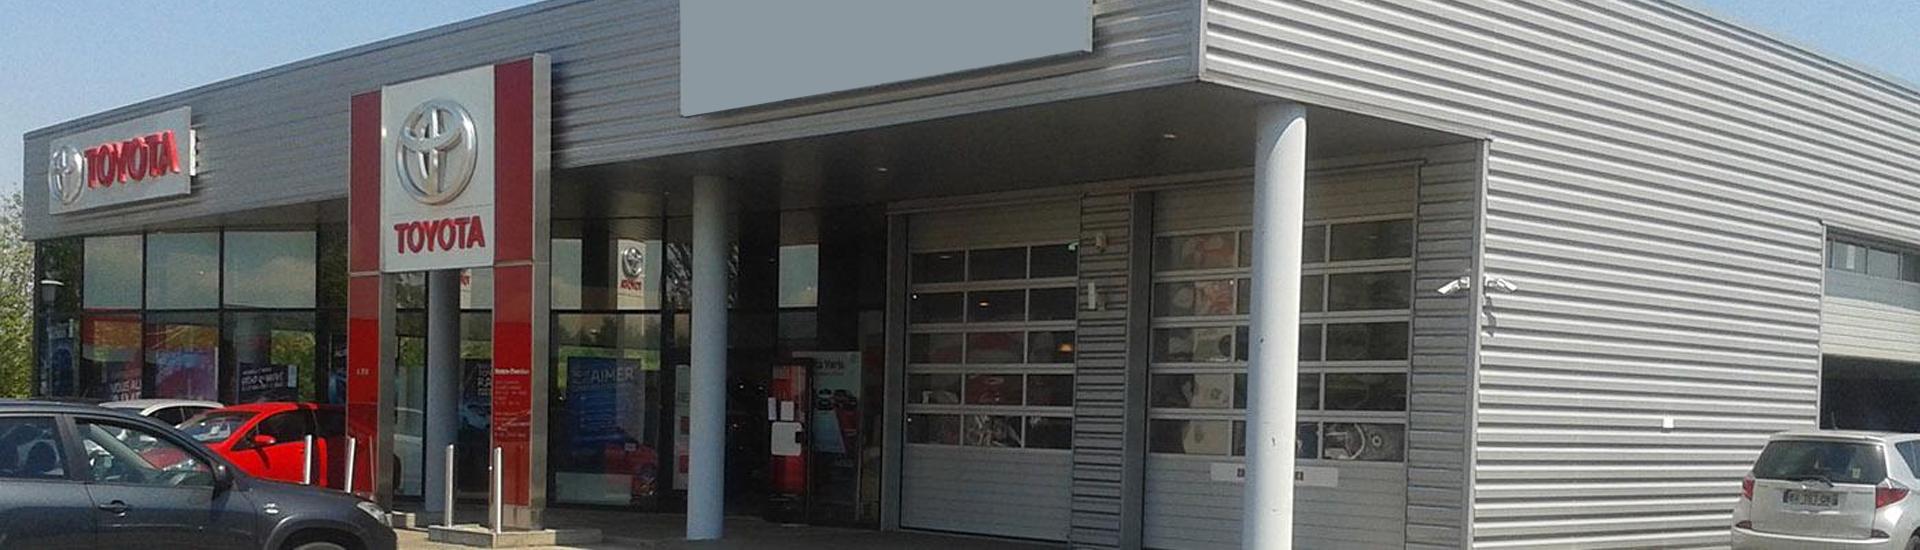 Facade de la concession TOYOTA Toys Motors à Sarrebourg en Moselle.